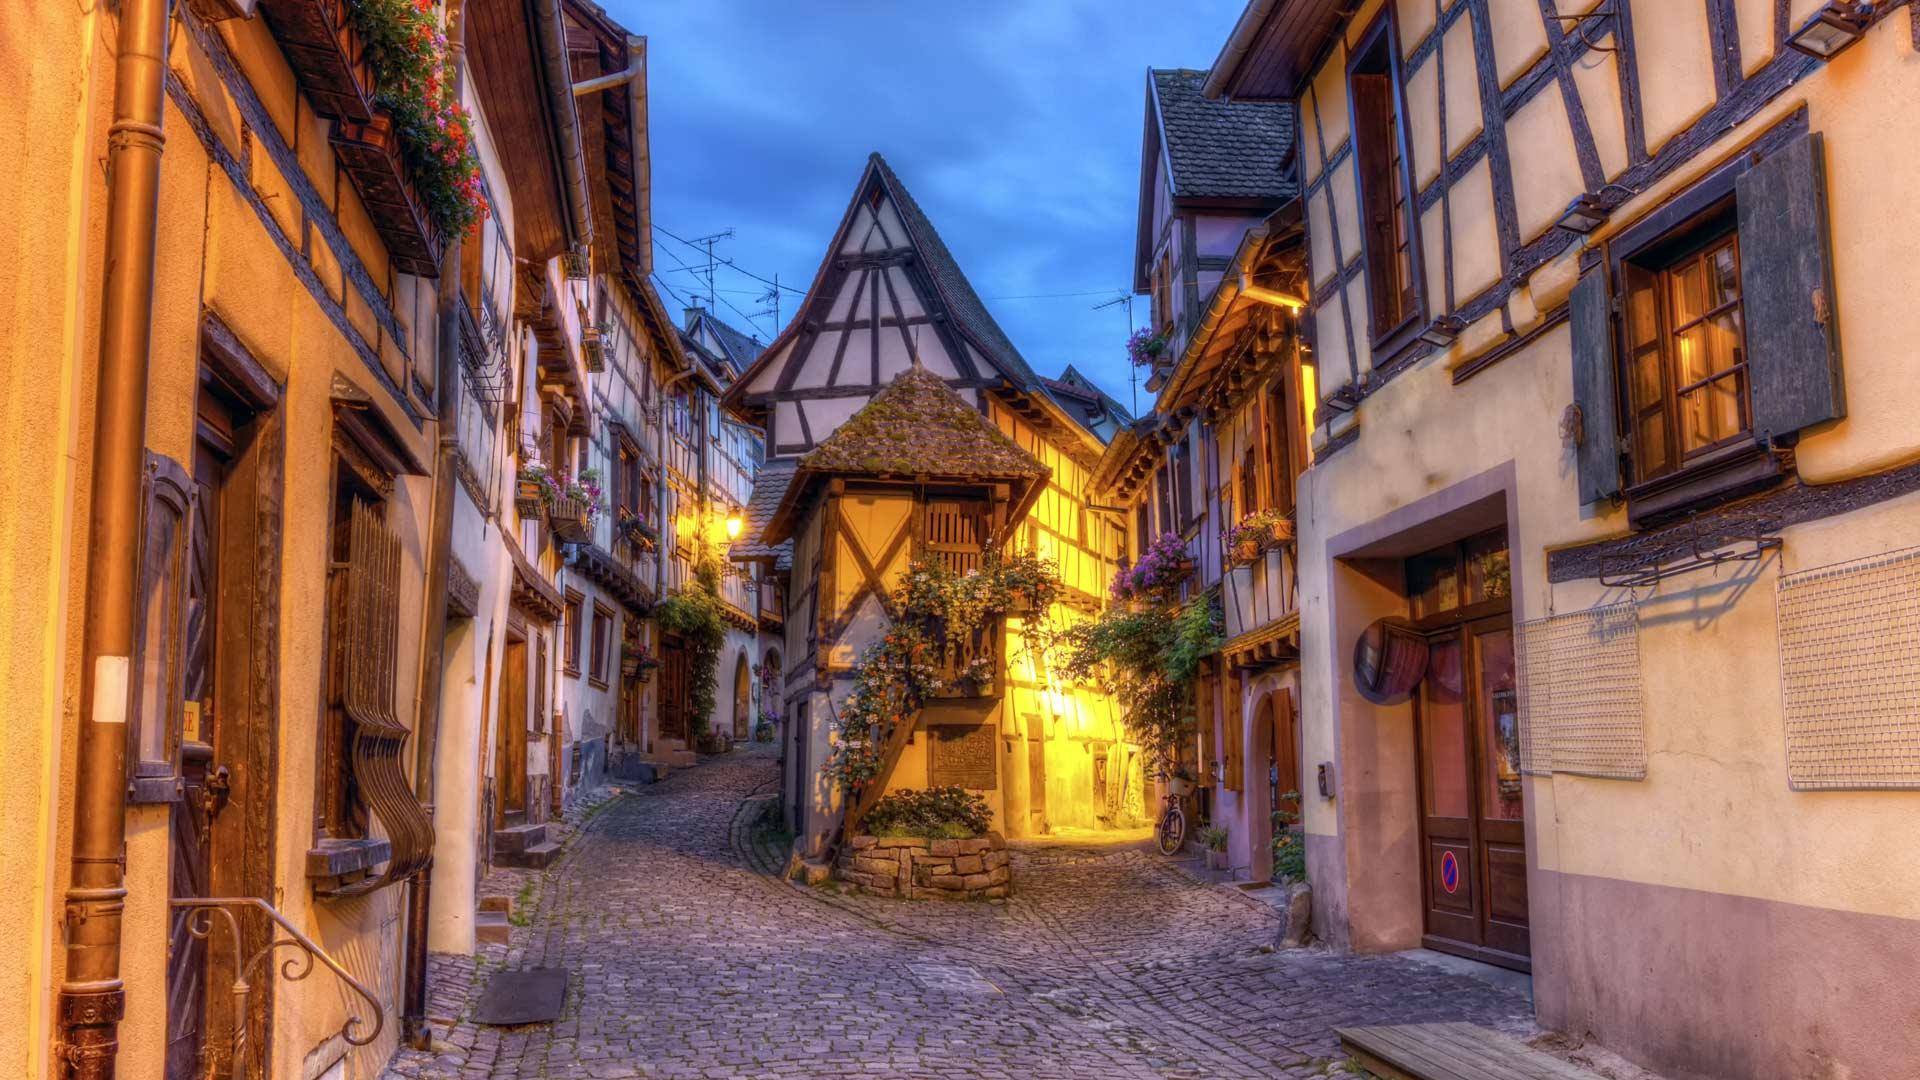 Rempart-sud street in Eguisheim, Alsace, France